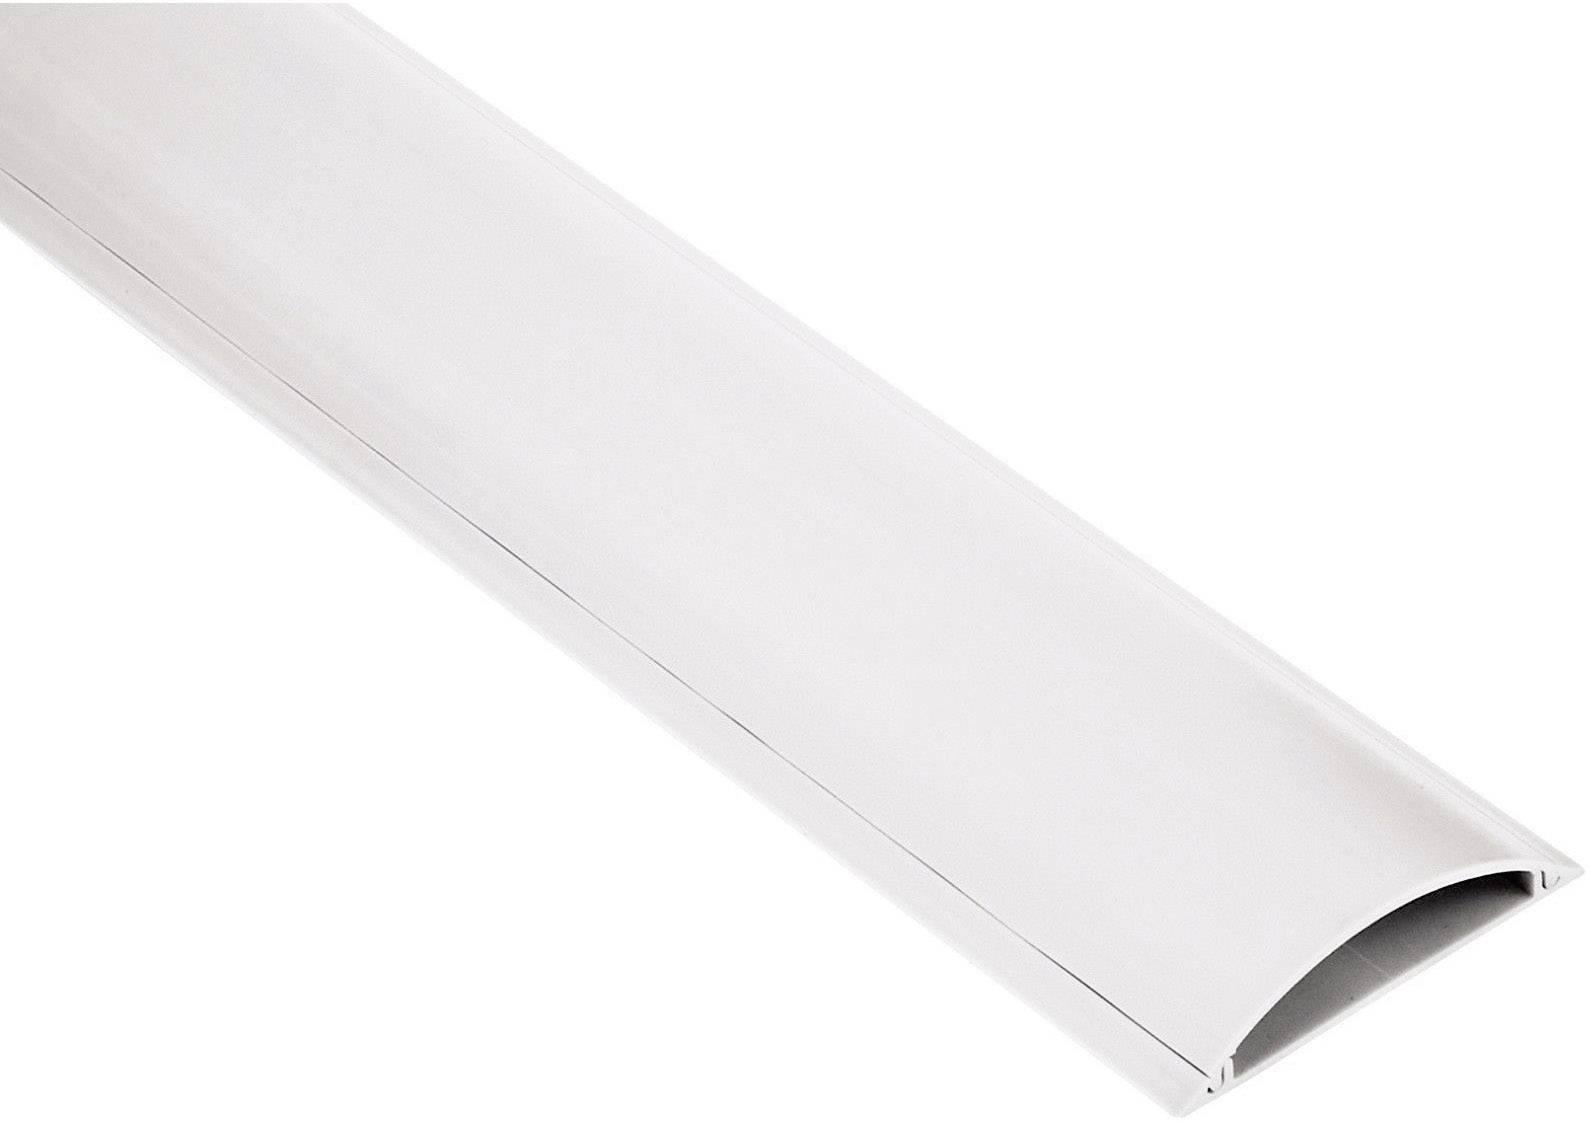 Hama Canalina passacavi PVC Bianco